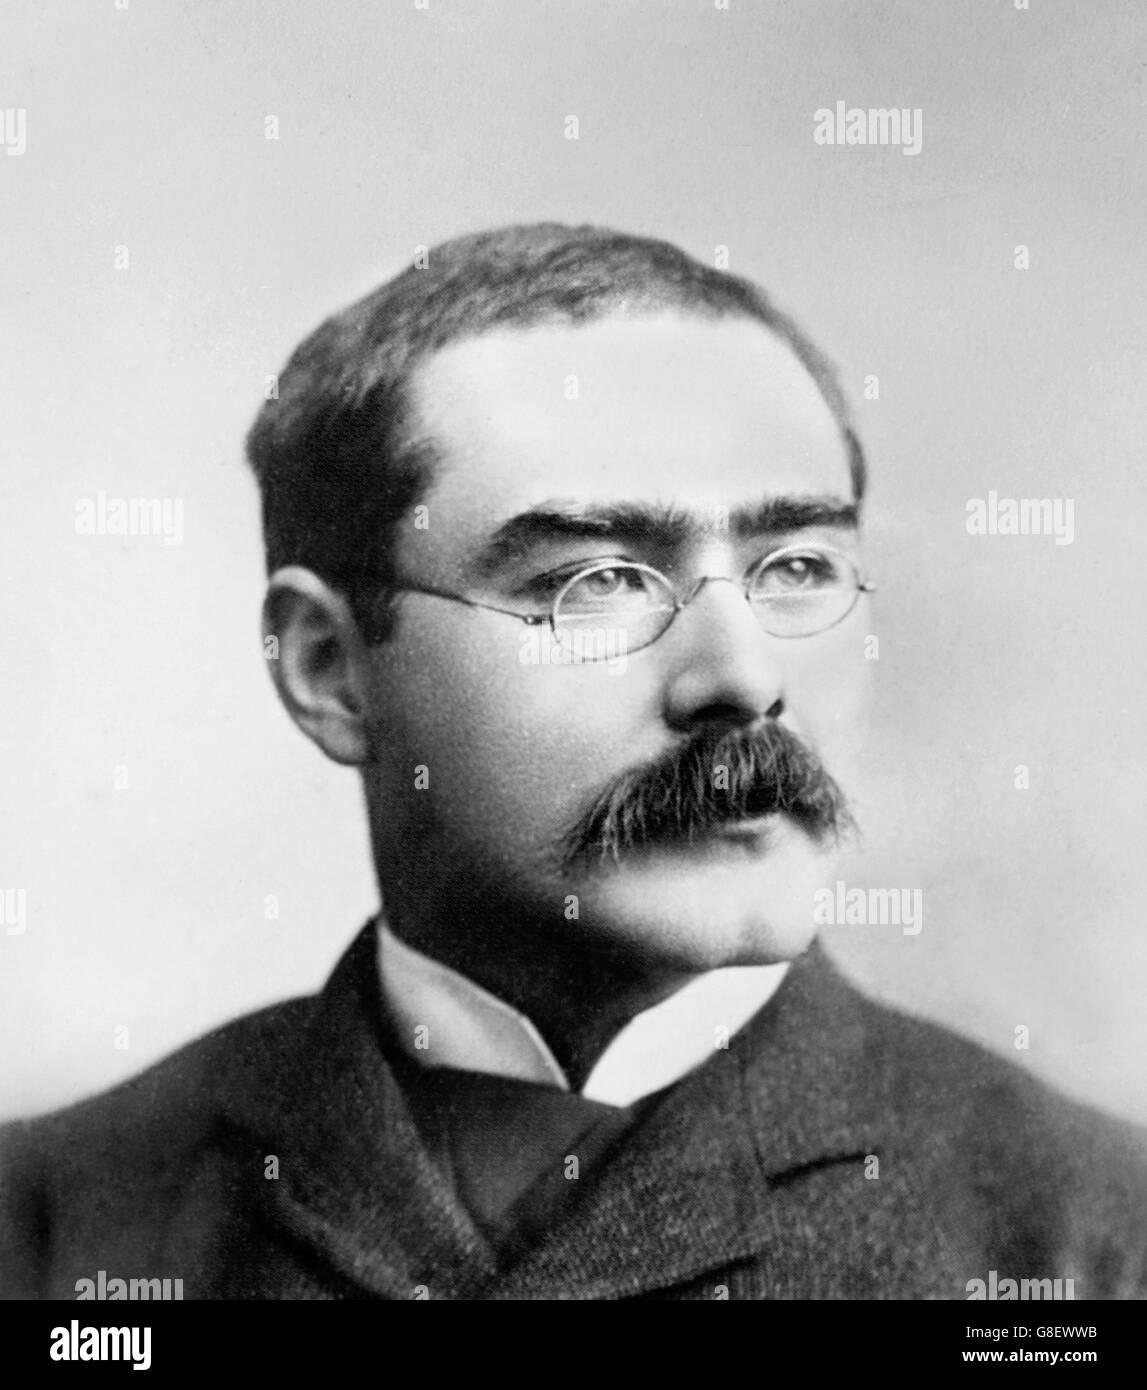 Rudyard Kipling. Portrait of the English writer, Joseph Rudyard Kipling. Photo by Bain News Service, date unknown - Stock Image